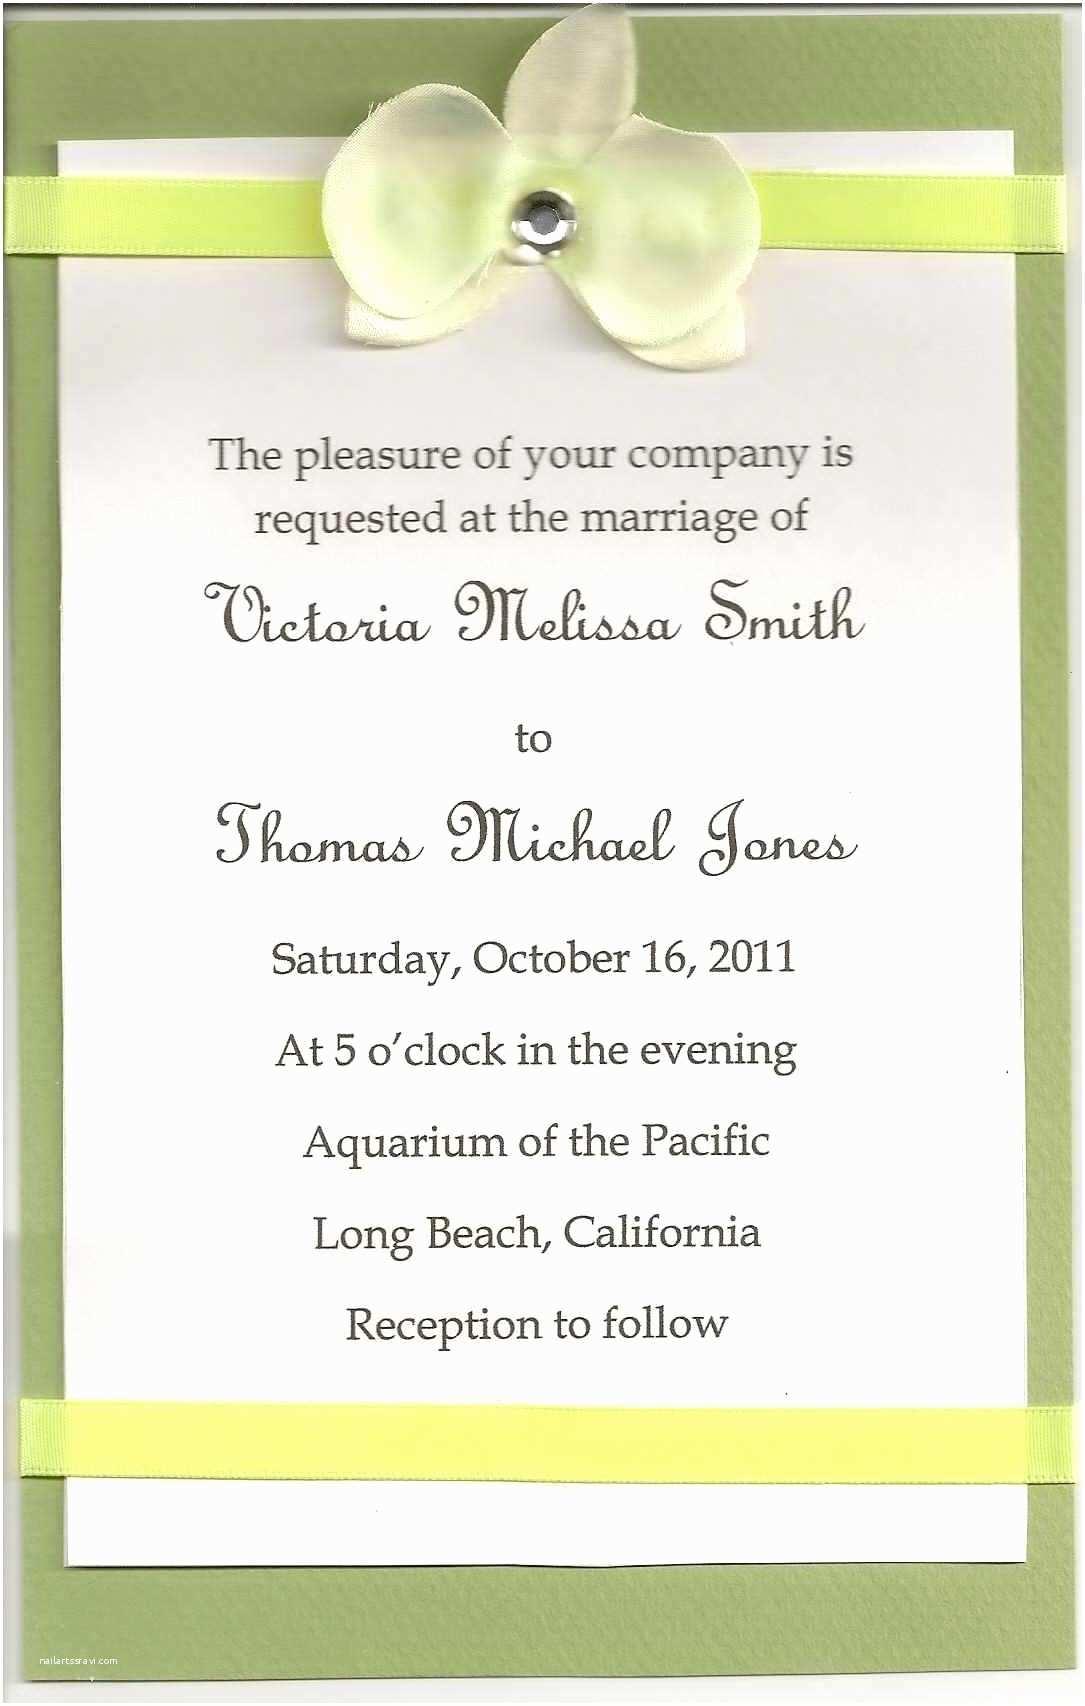 Wedding Invitation Phrases for Friends Wedding Invitation Wording to Friends Email Best